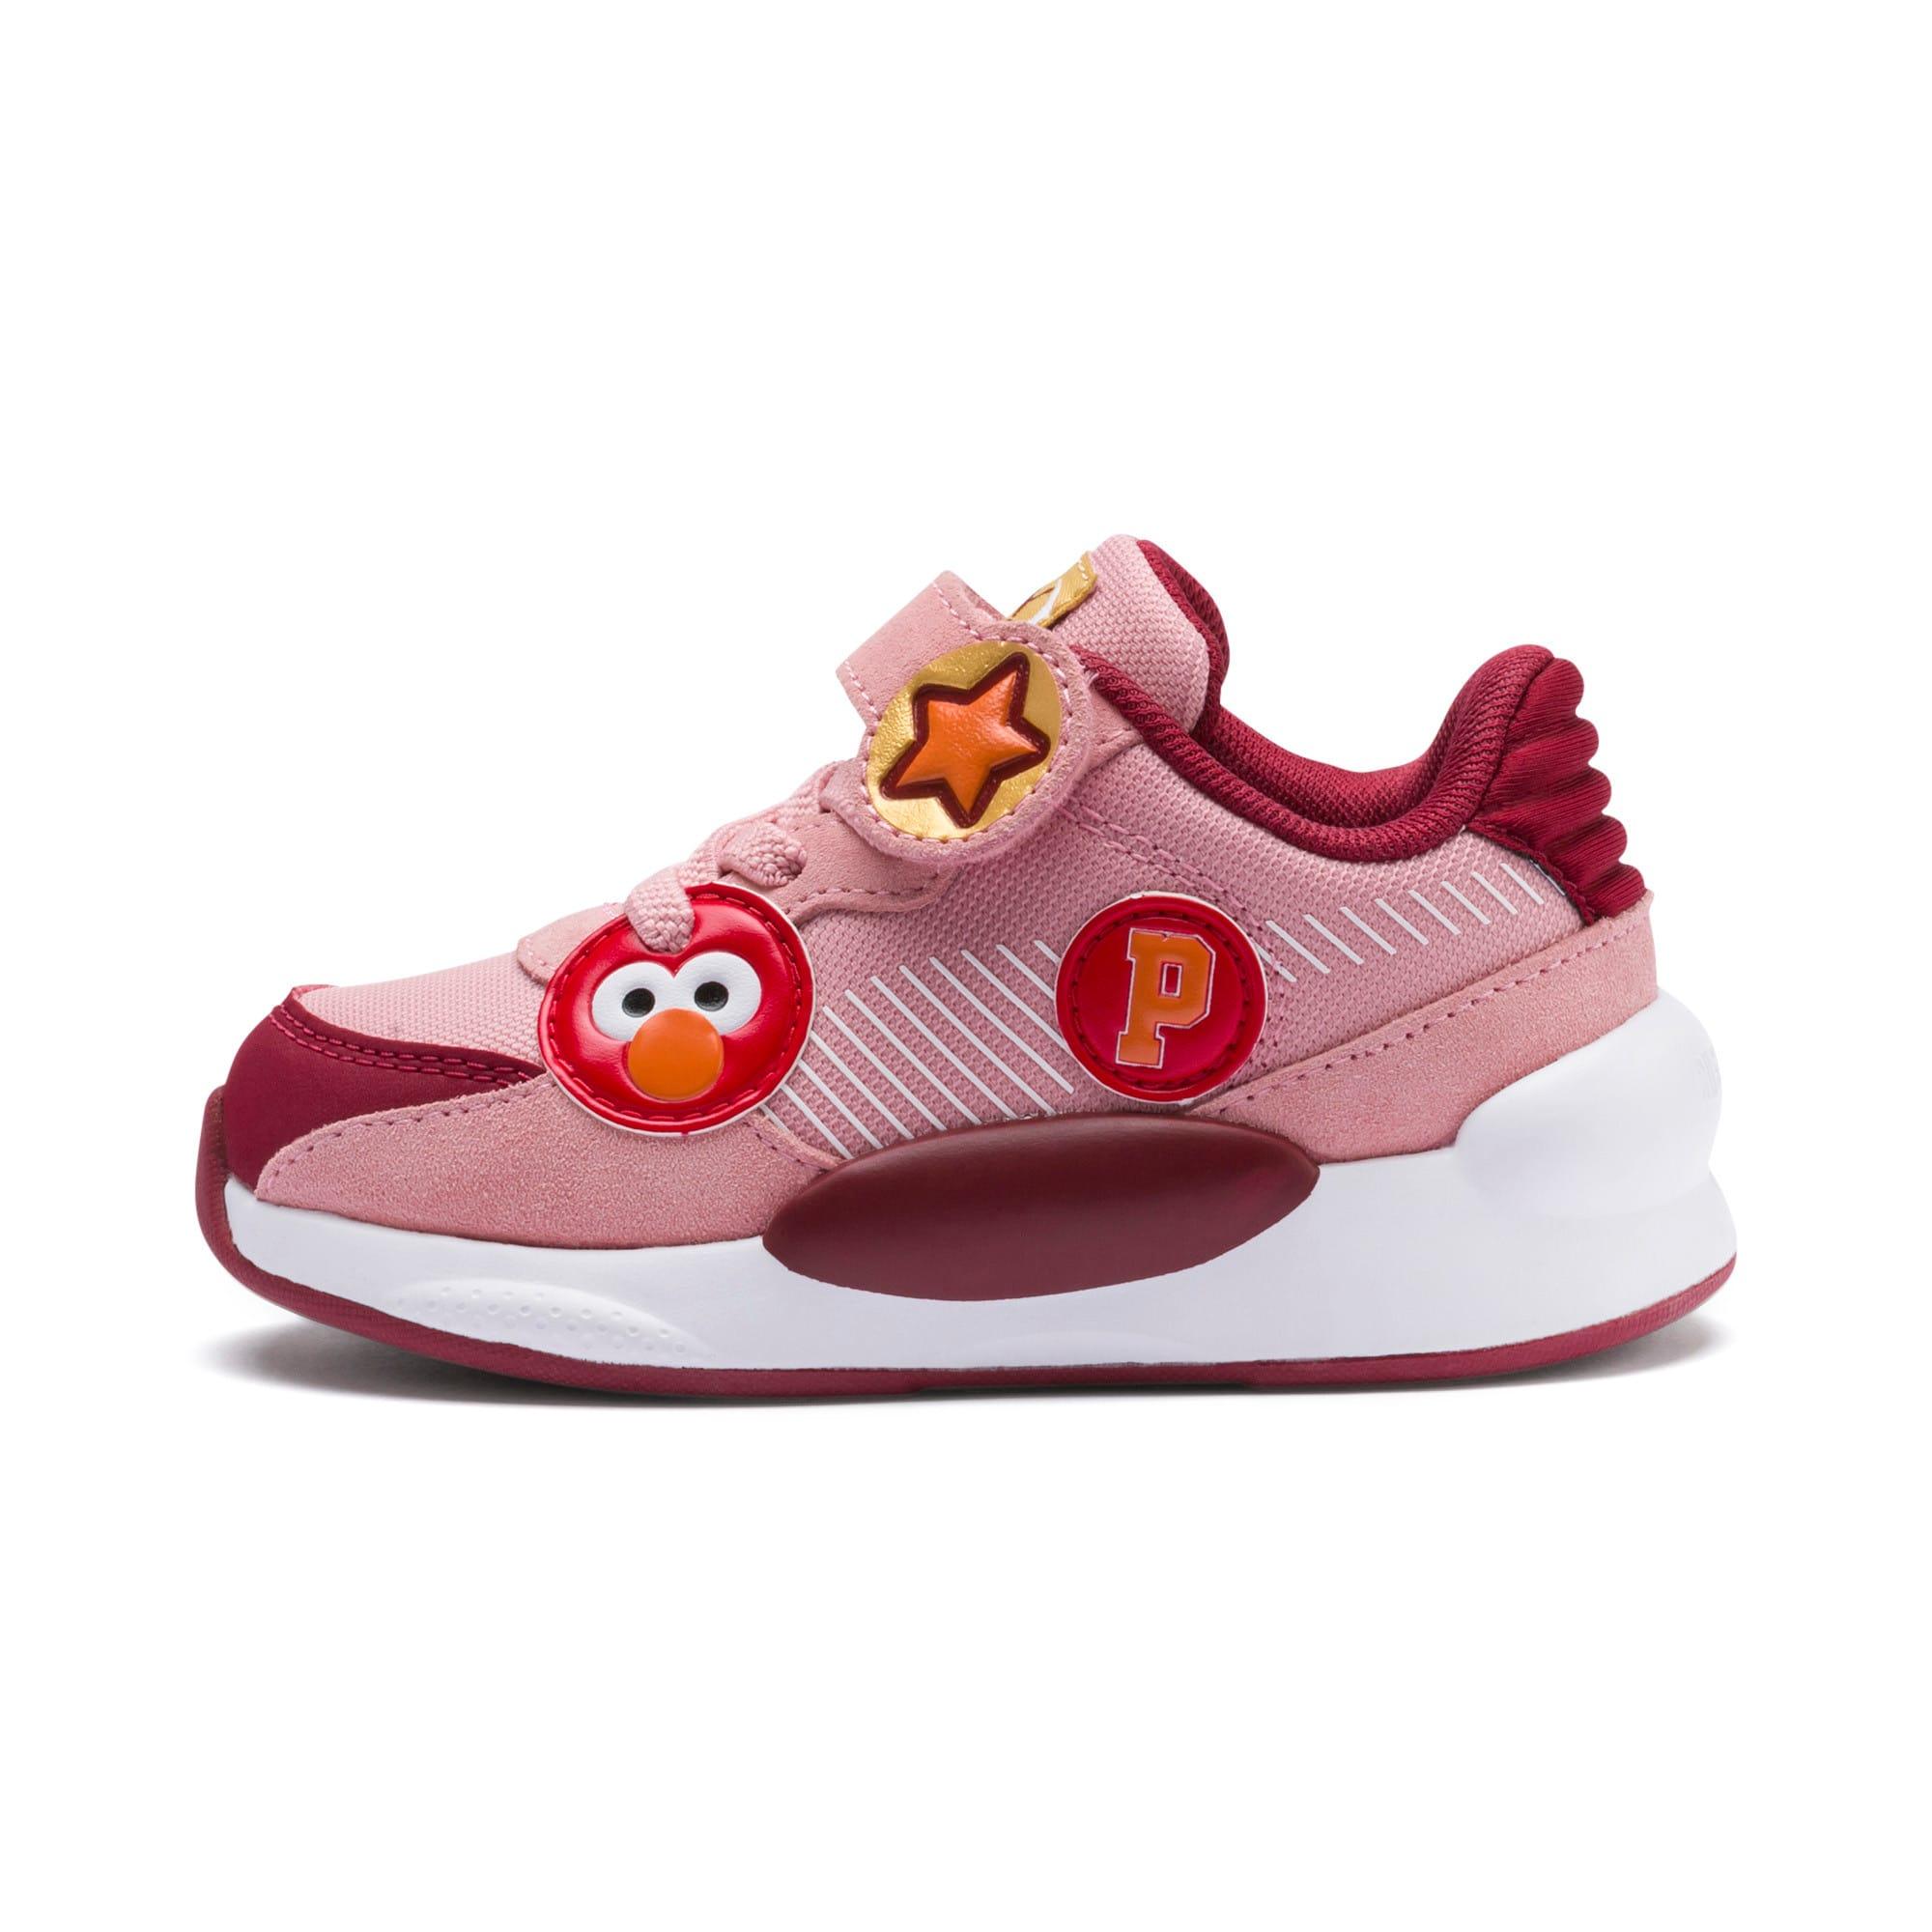 Thumbnail 1 of PUMA x SESAME STREET 50 RS 9.8 Toddler Shoes, Bridal Rose-Rhubarb, medium